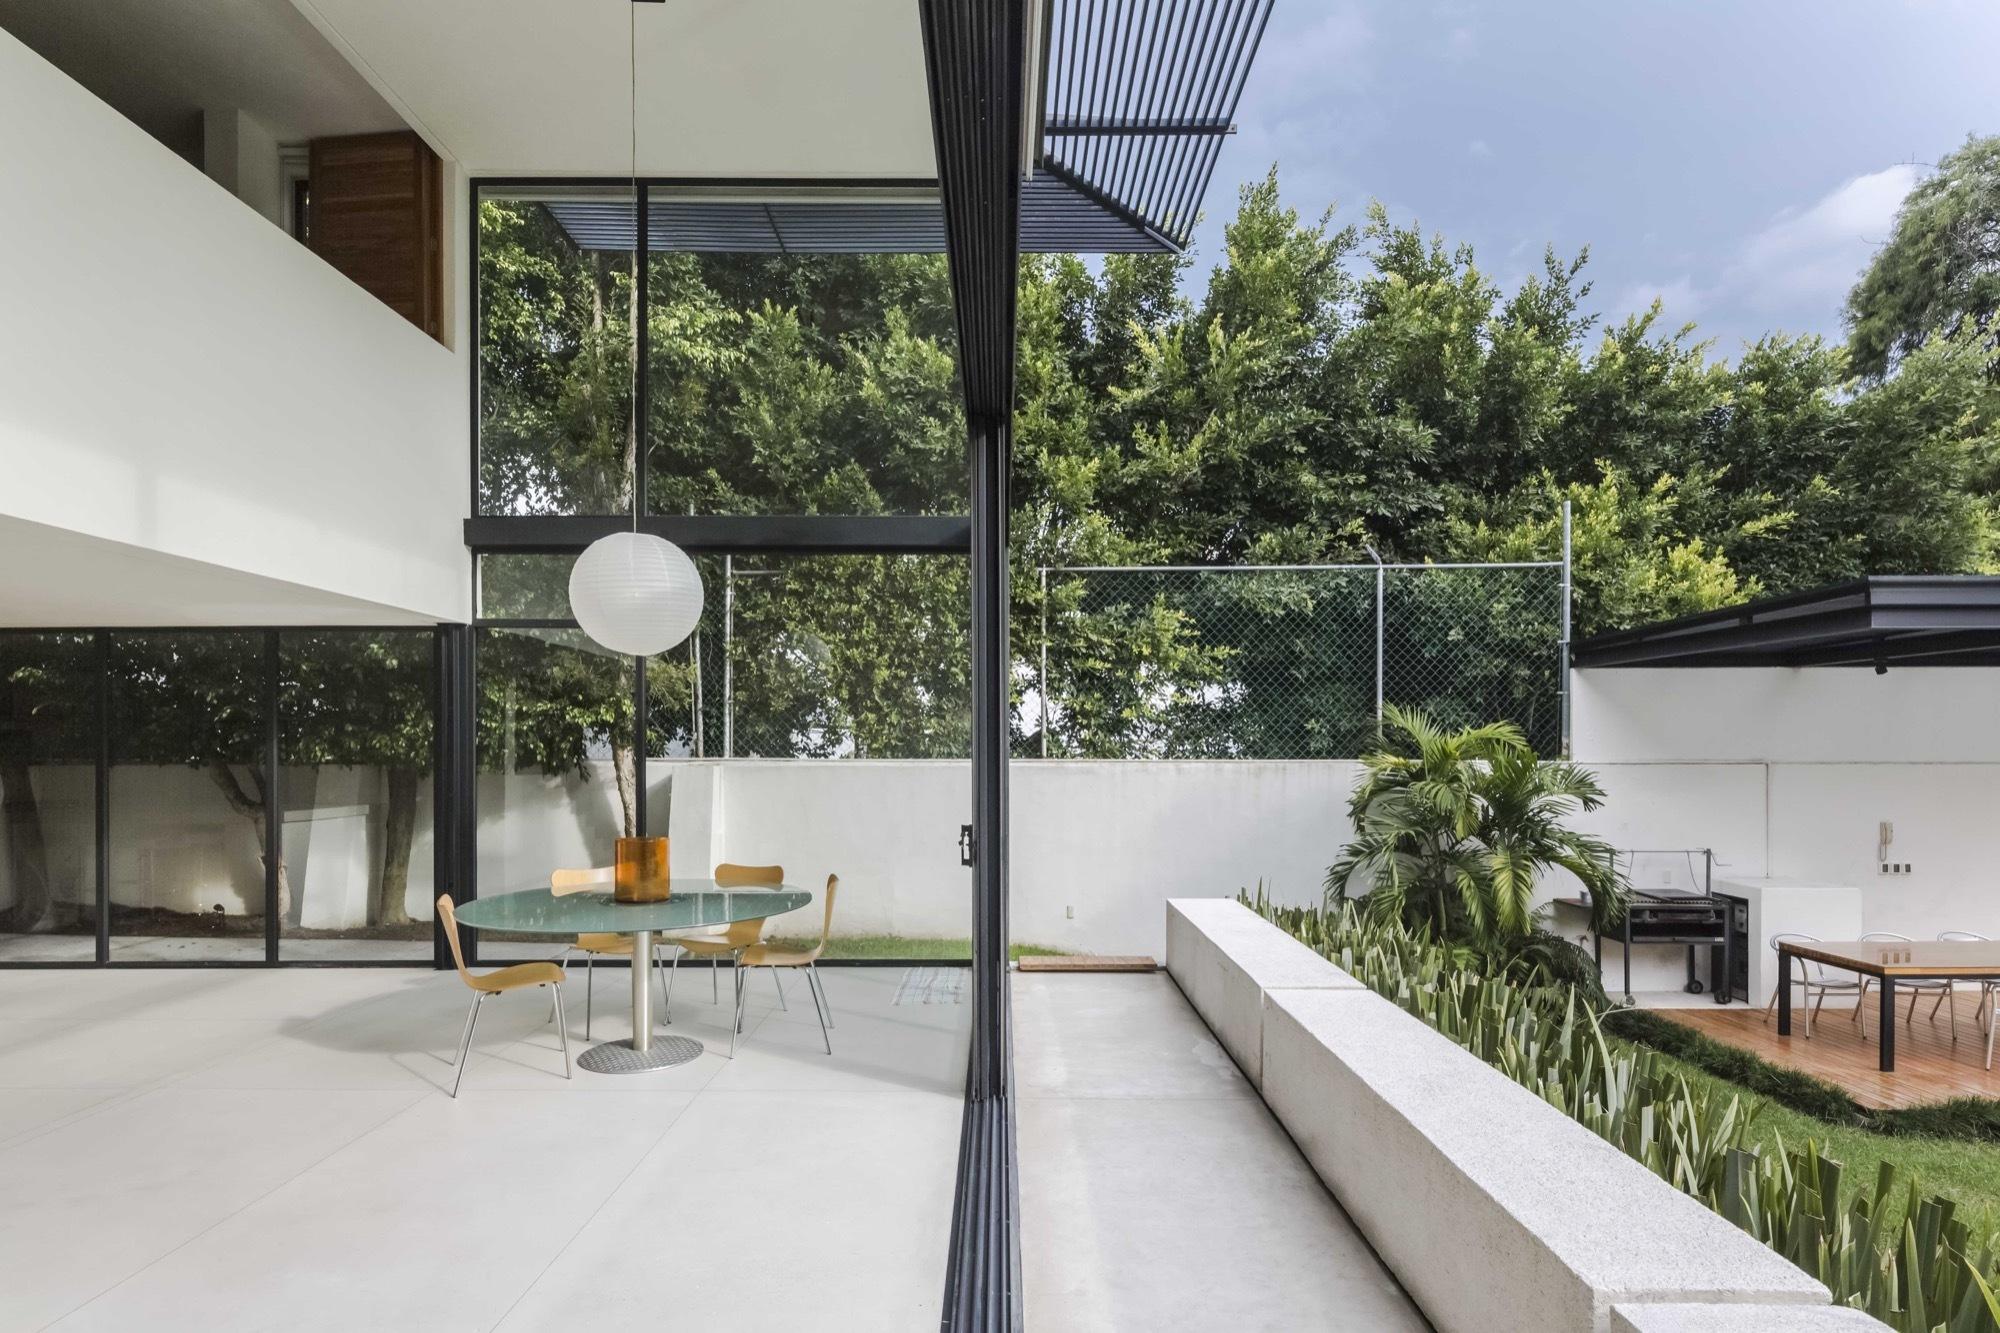 Galer a de casa garza estudio fi arquitectos 3 - Estudio 3 arquitectos ...